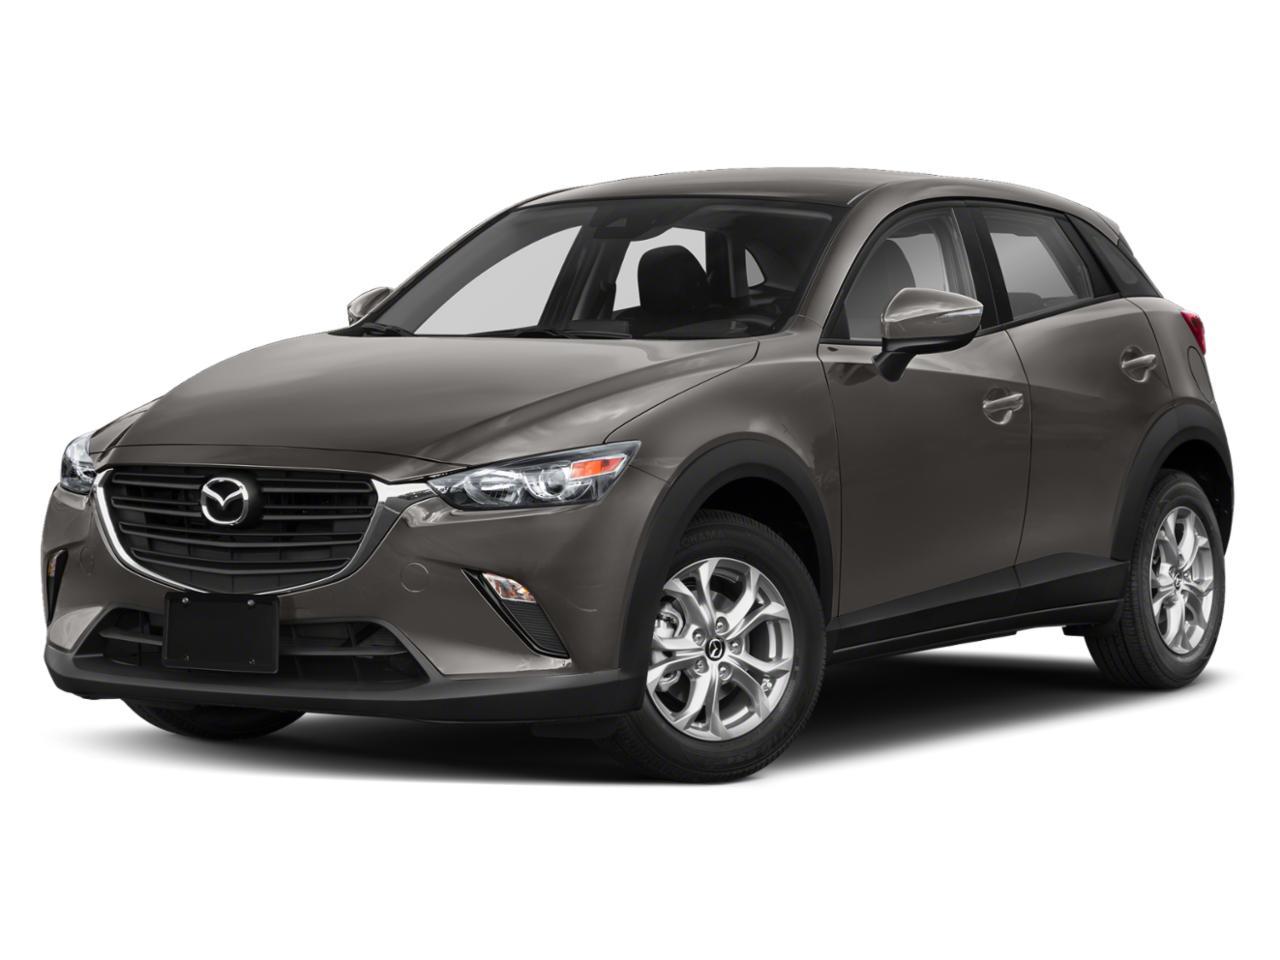 2020 Mazda CX-3 Vehicle Photo in Rockville, MD 20852